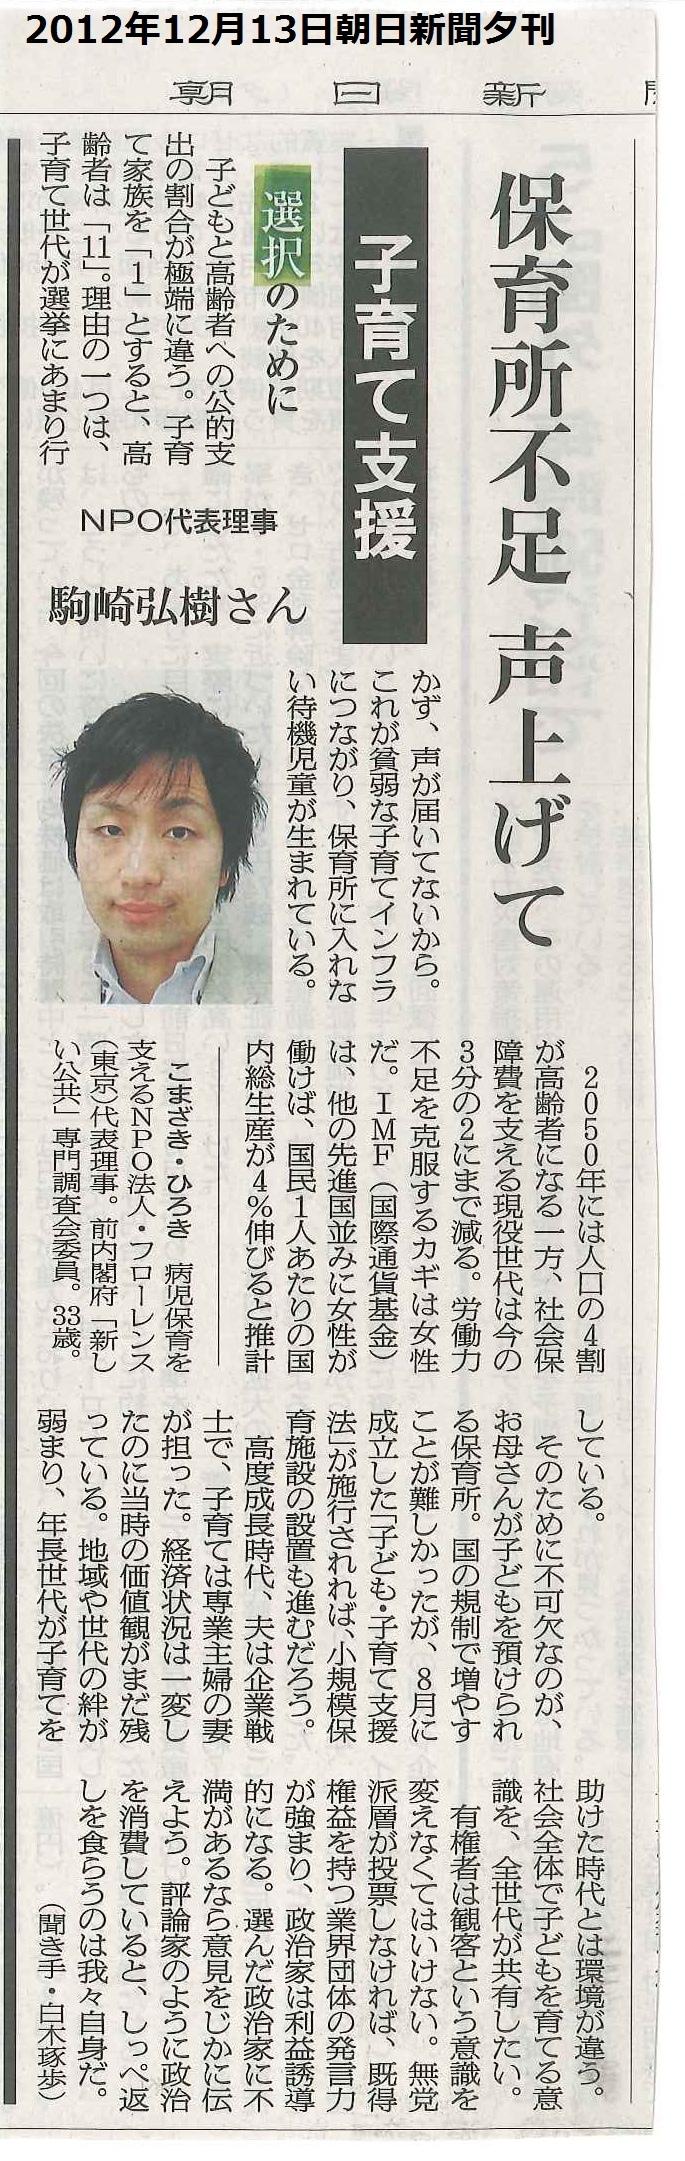 NC_【2012衆院選_子育て支援】朝日新聞_20121213_保育所不足声上げて.jpg